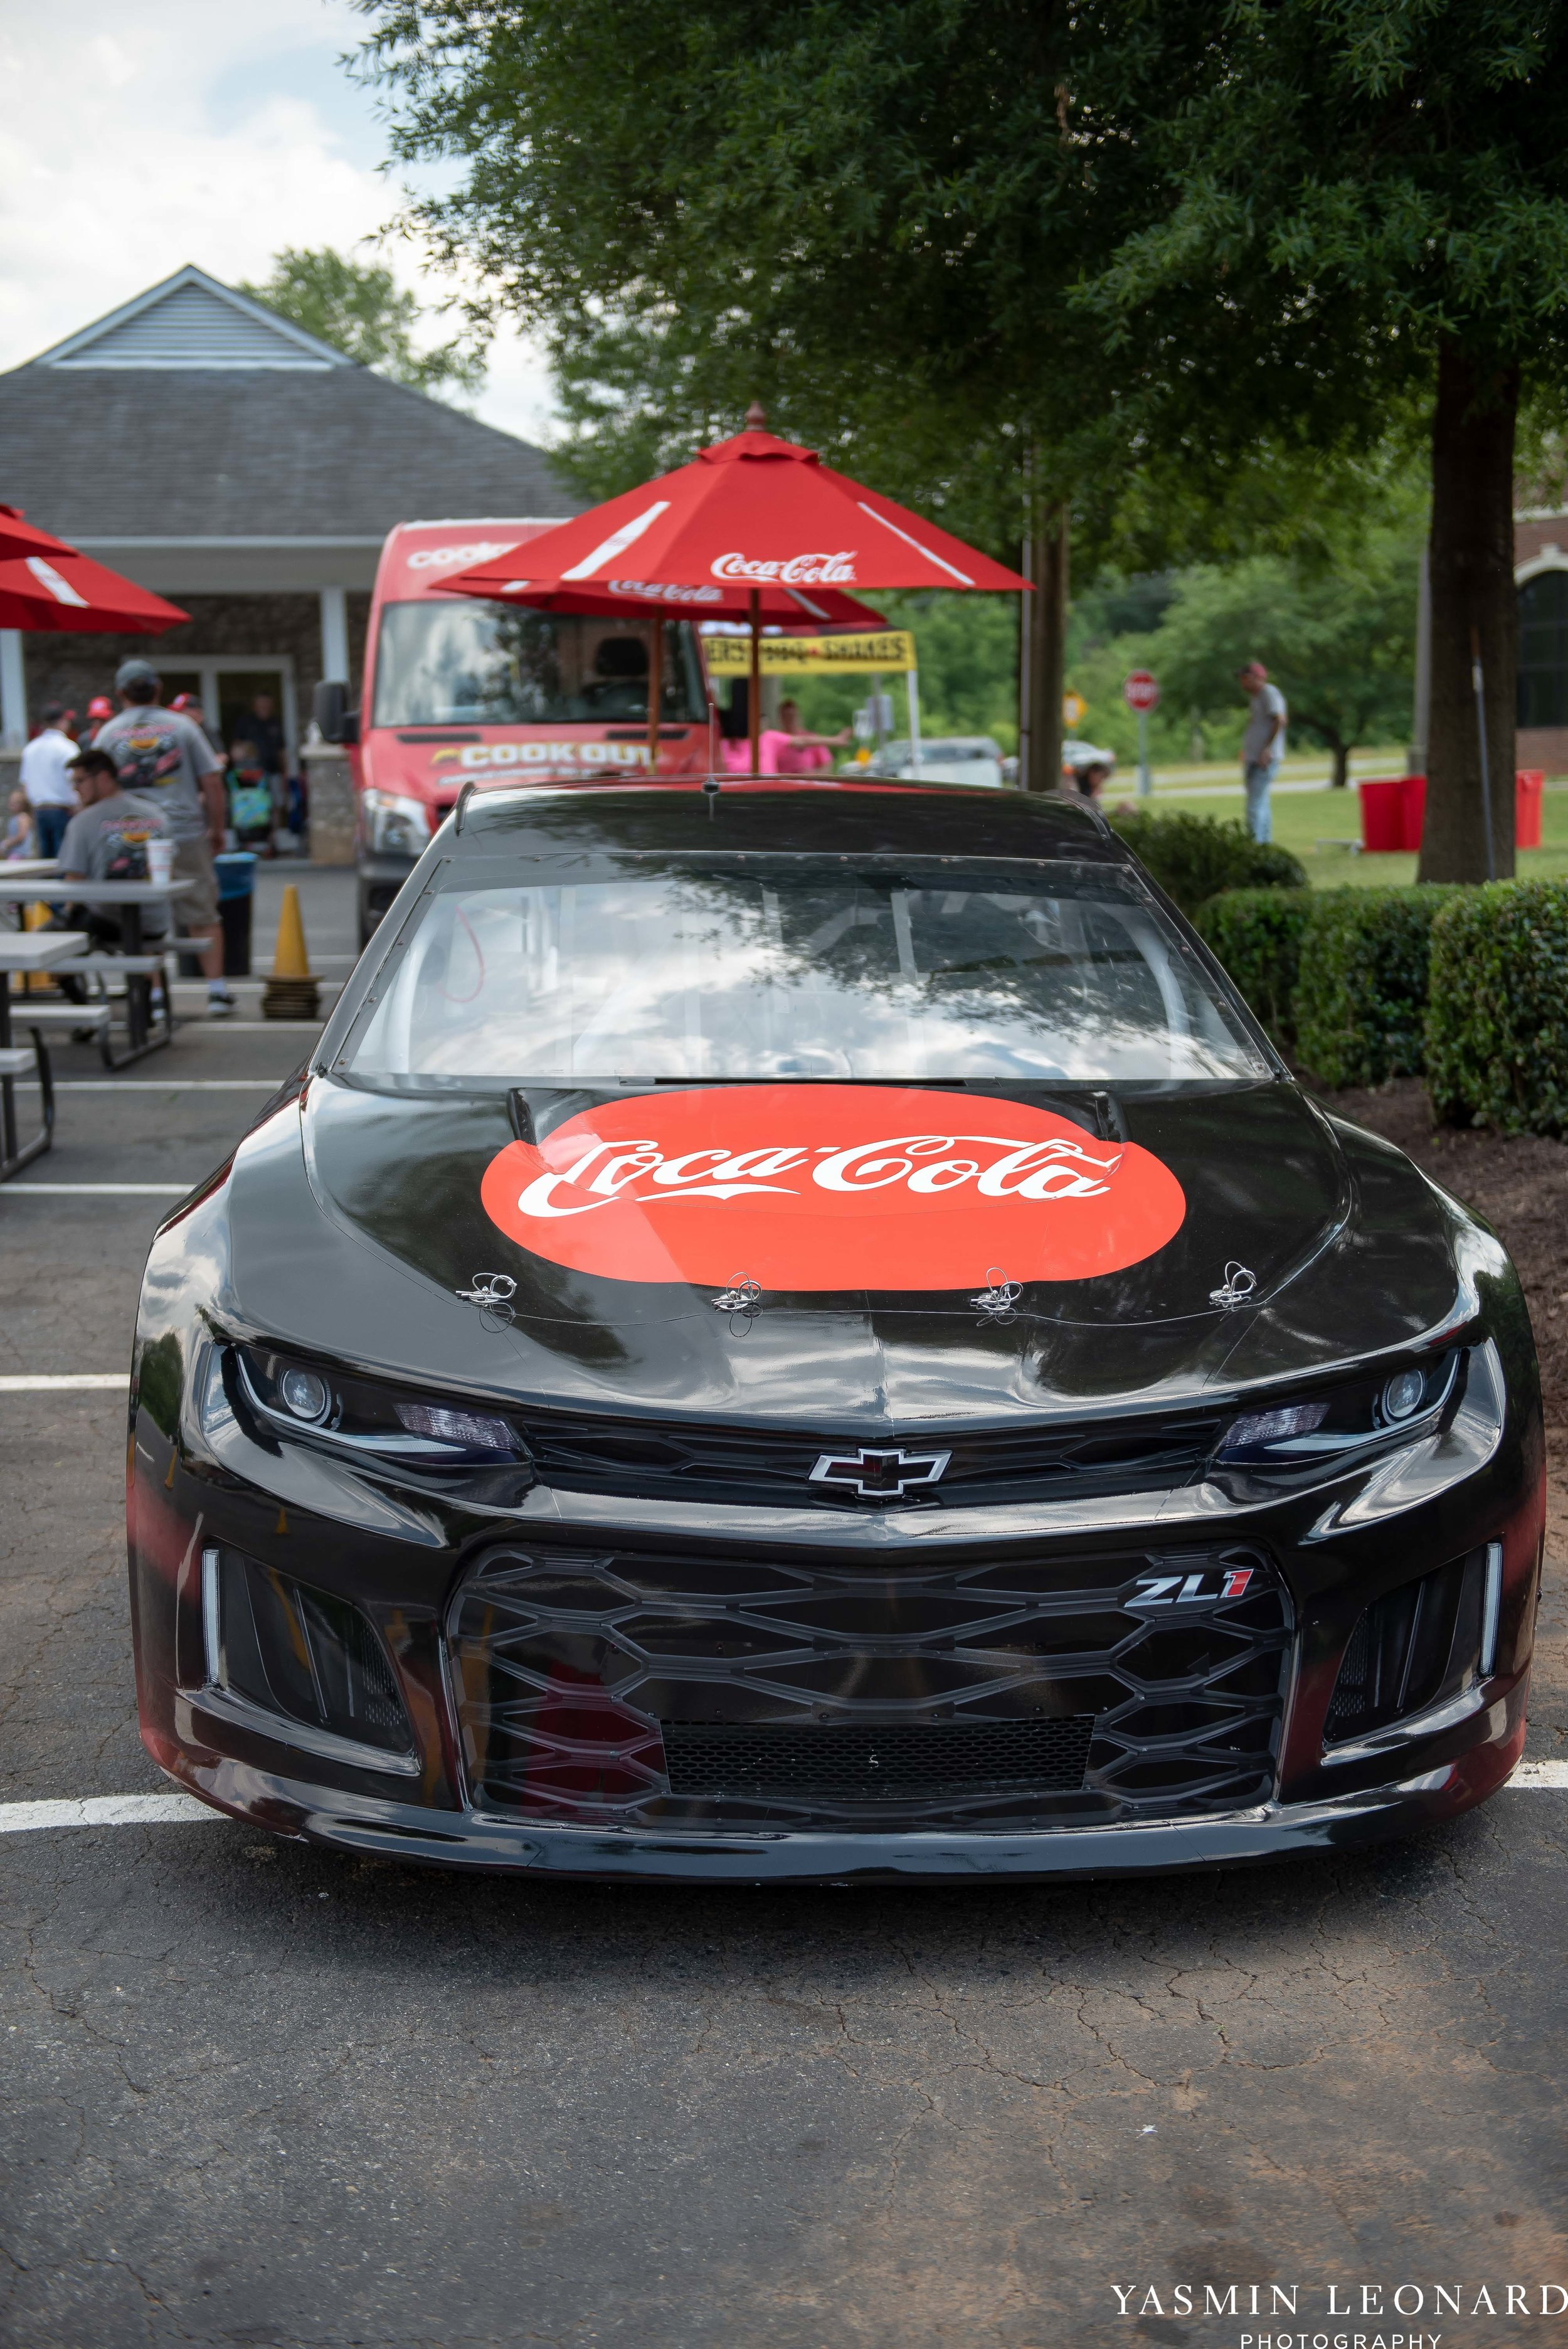 Cookout - CocaCola 600 - Coca Cola - Austin Dillon - Nascar - Nascar Meet and Greet - Yasmin Leonard Photography-2.jpg